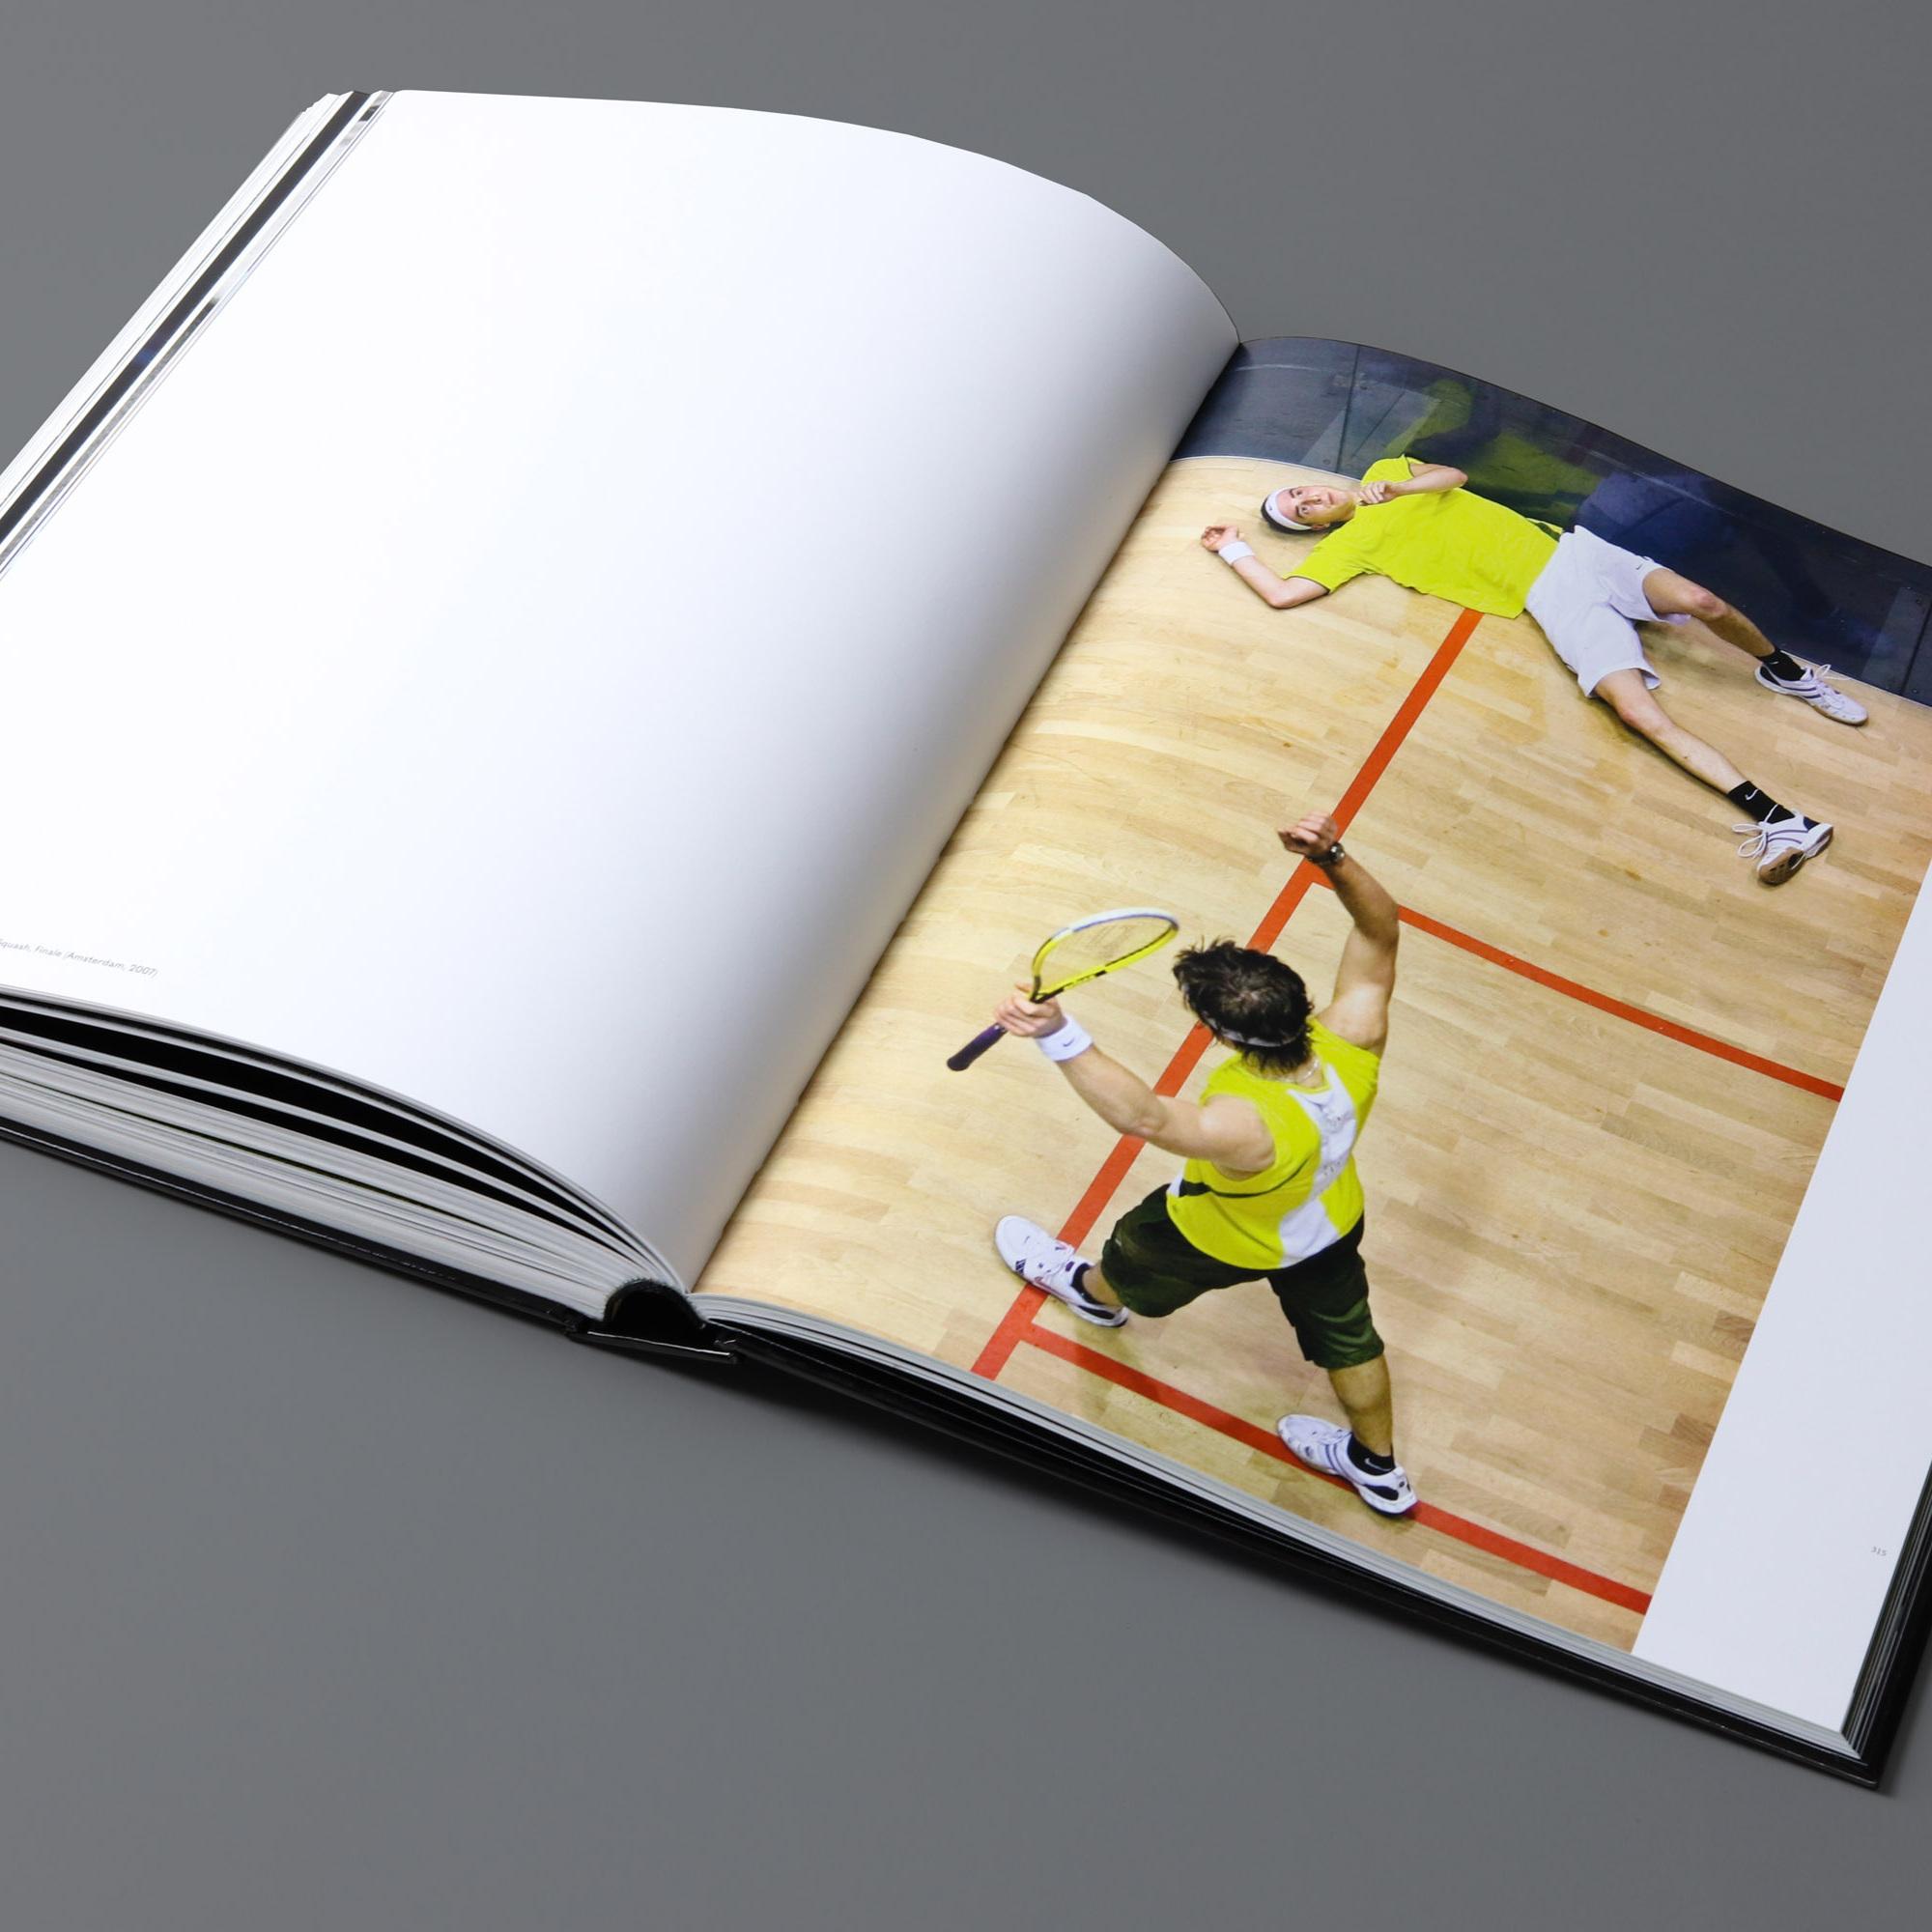 mendo-books-Sportret-studio-01-16-van-18-2000x2000-c-default.jpg